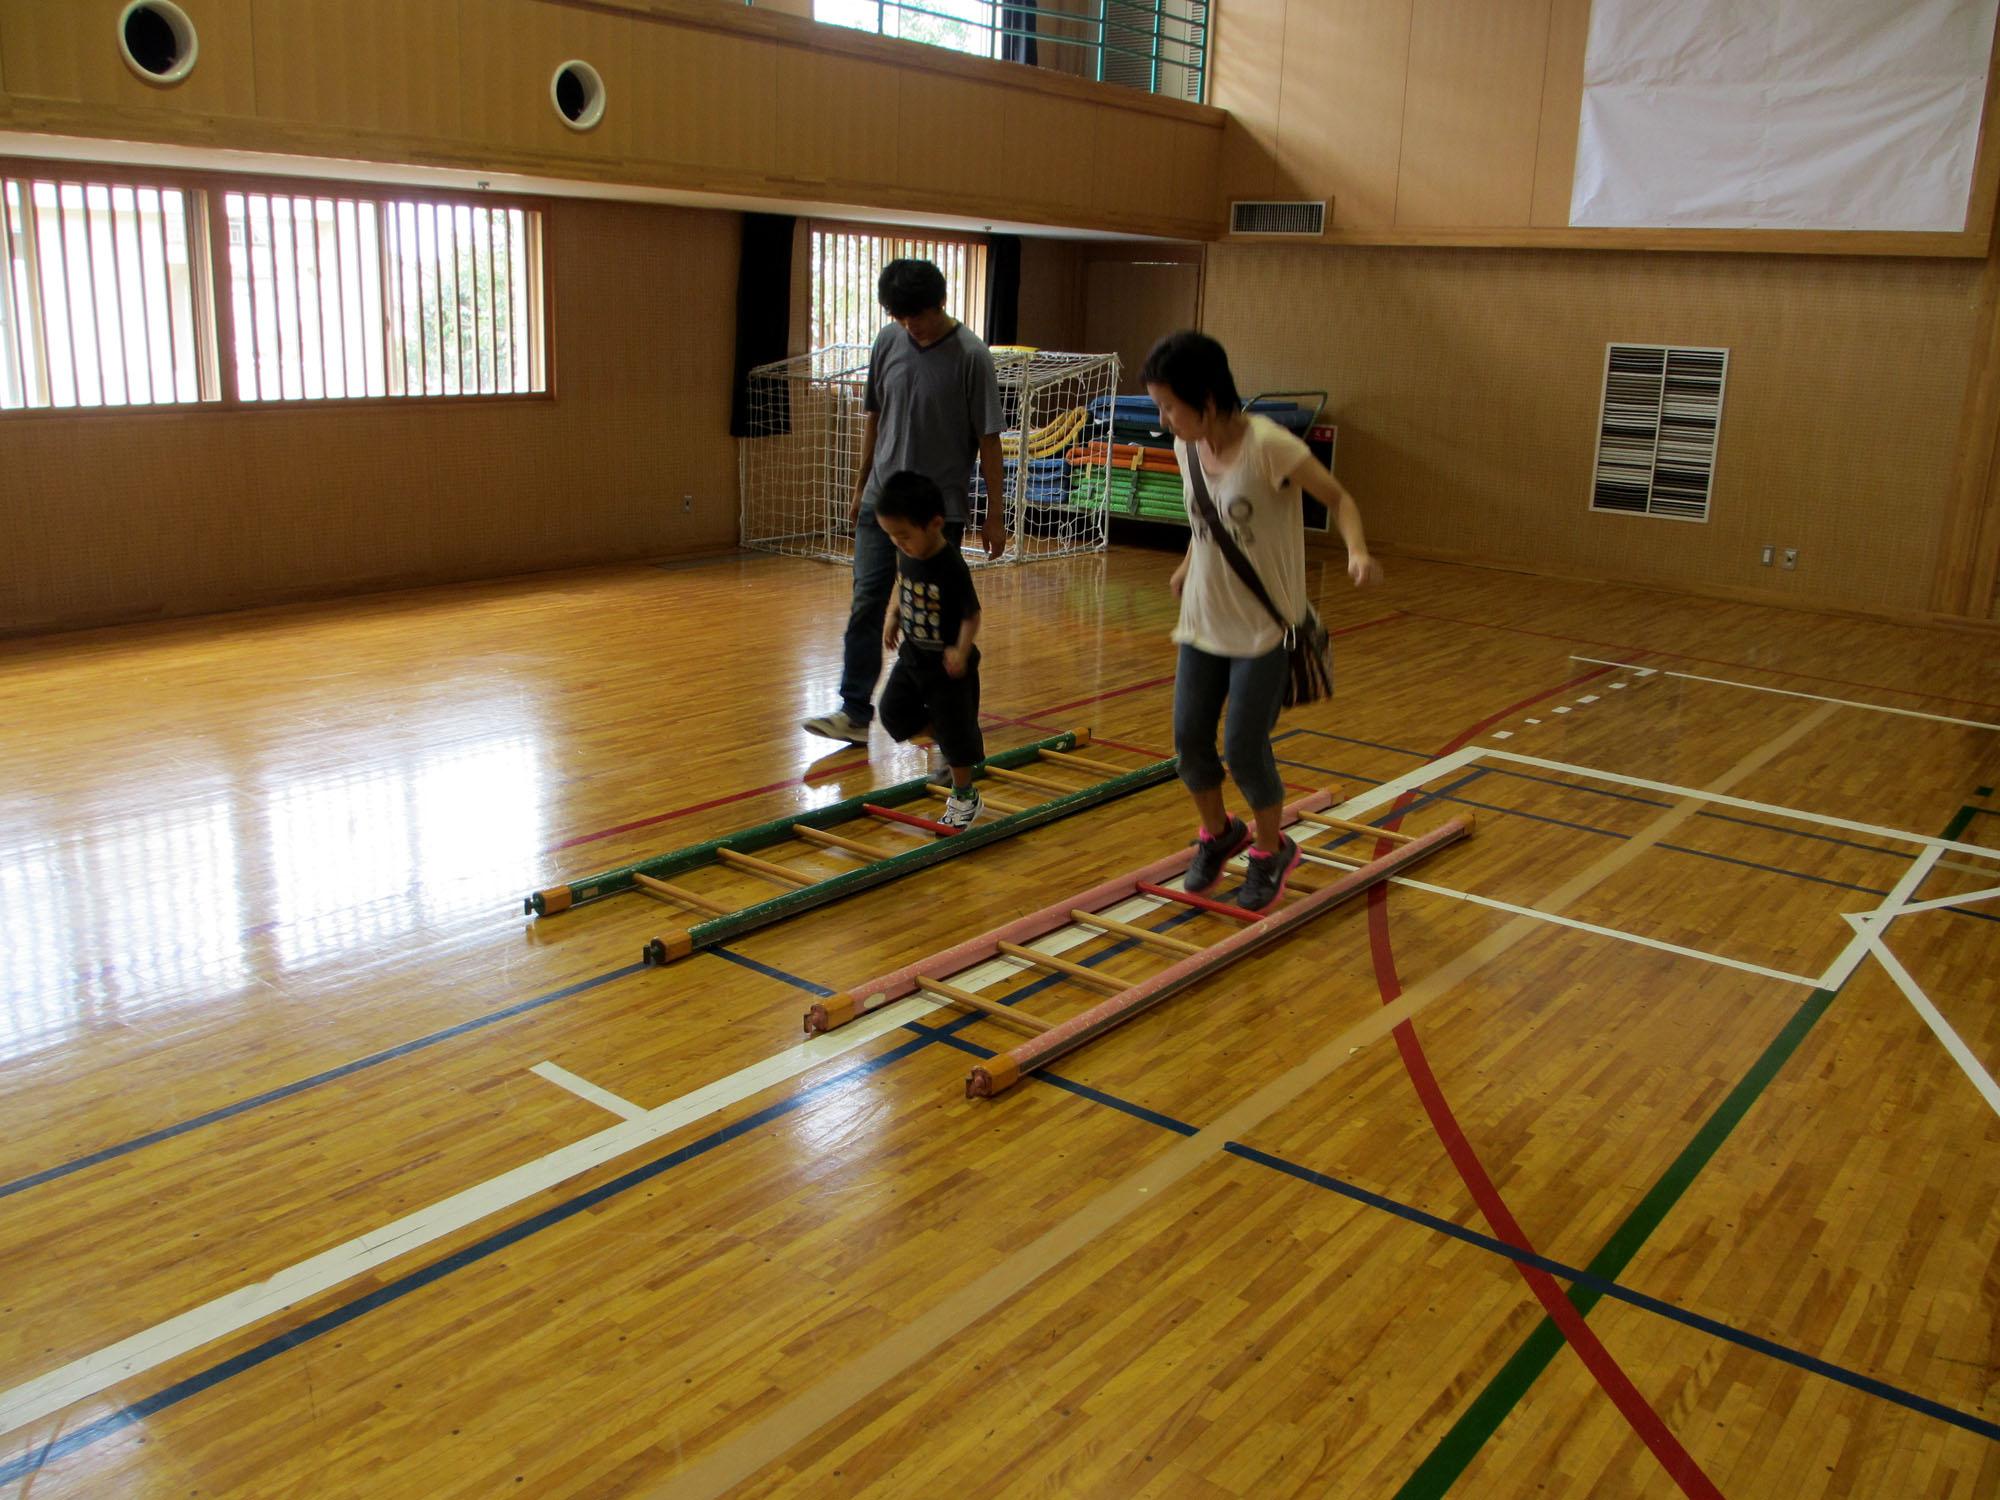 IMG 6980 - 地域振興事業より・・・小平市きっずスポーツ教室